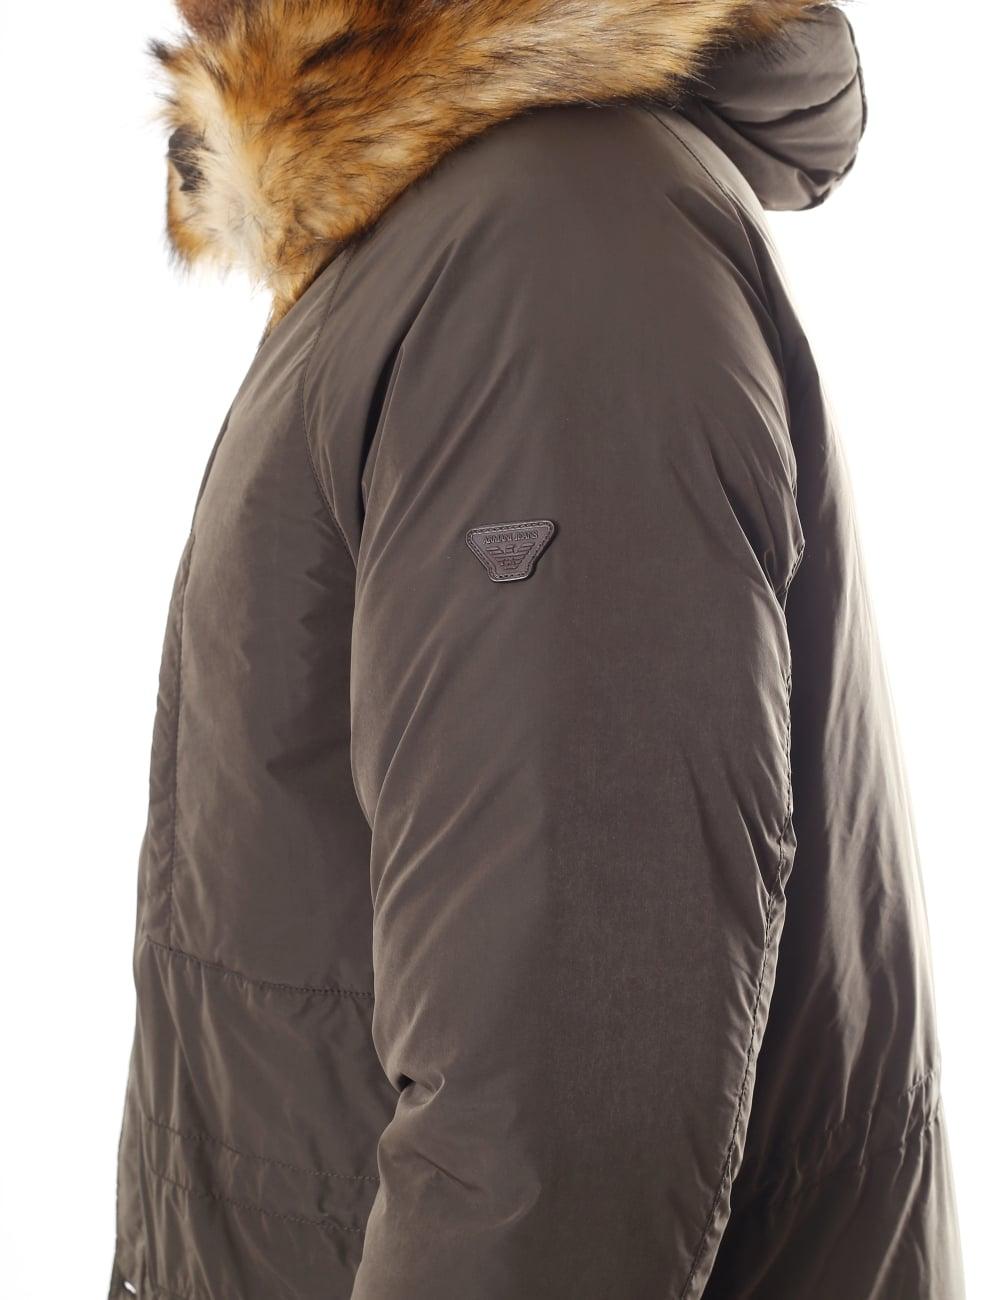 892d2e0d Armani Jeans Padded Men's Hooded Parka